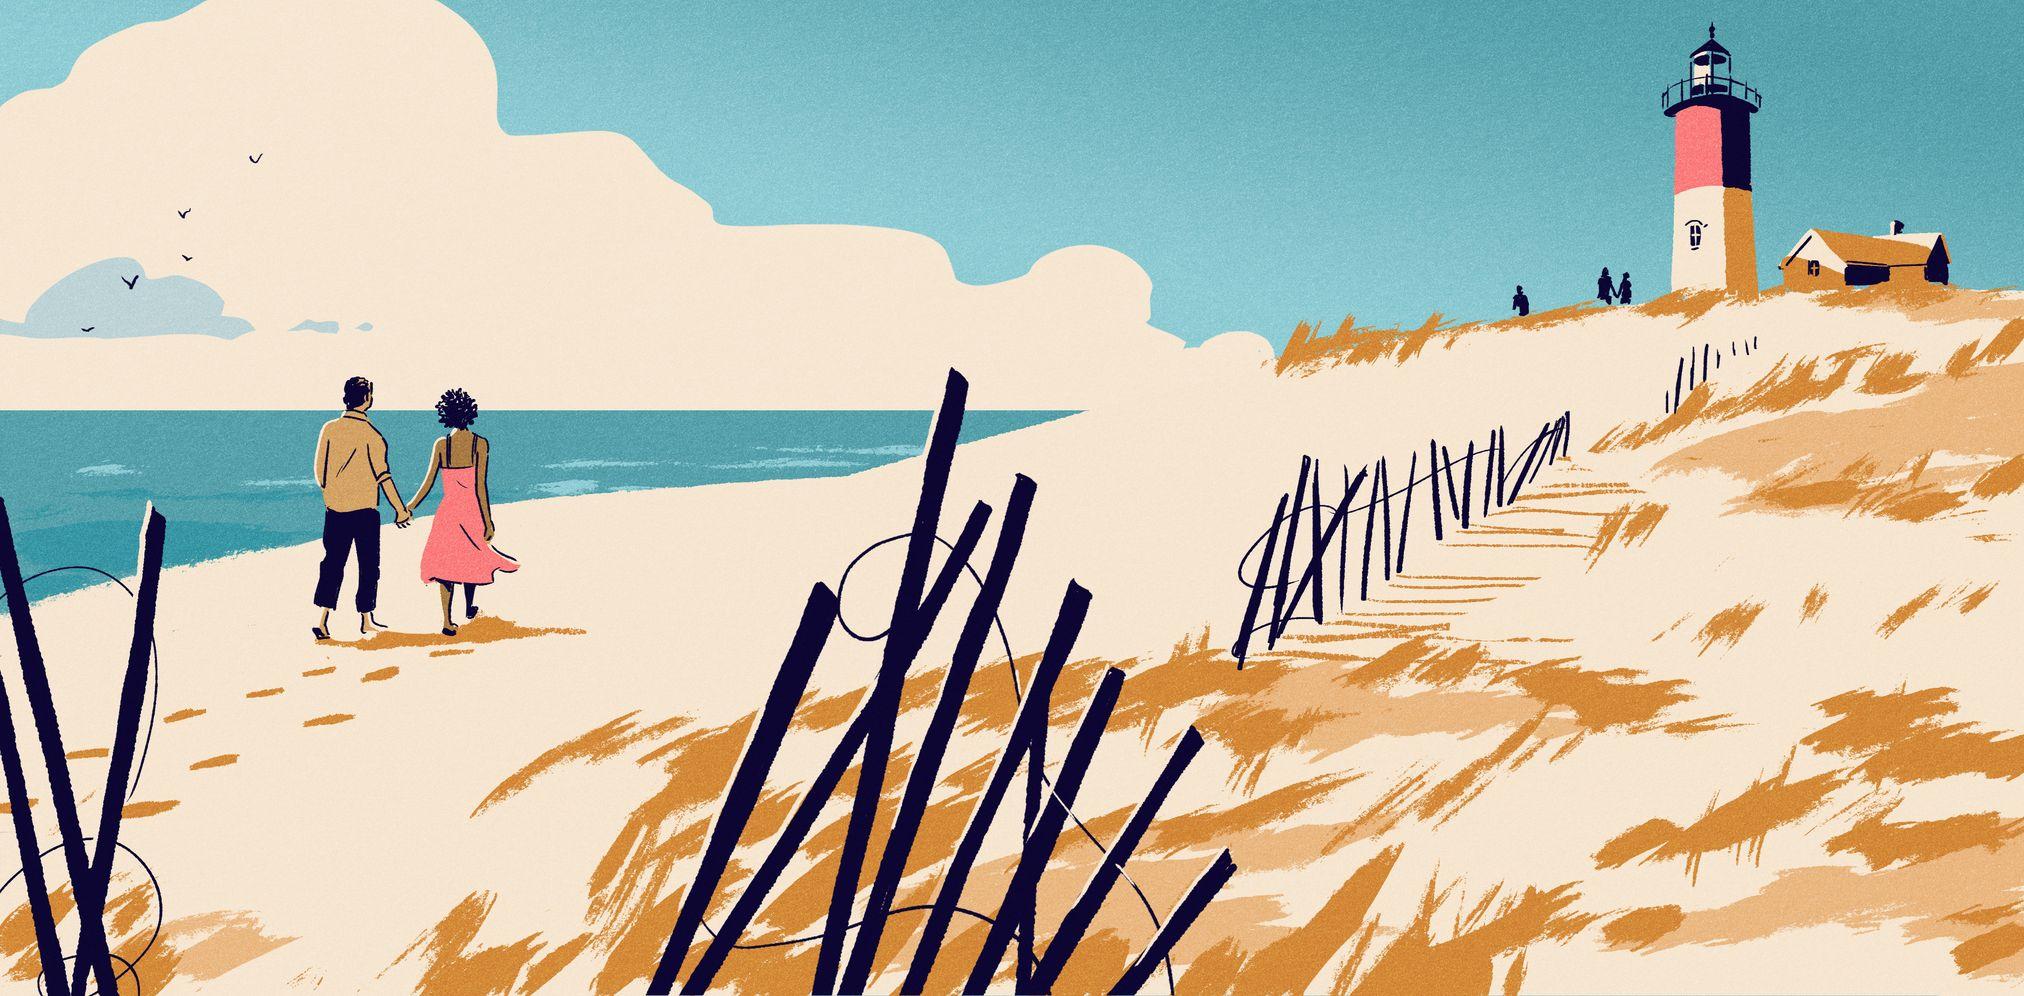 garance-illustration-jack-richardson-The-Boston-Globe-Walk-on-the-Beach